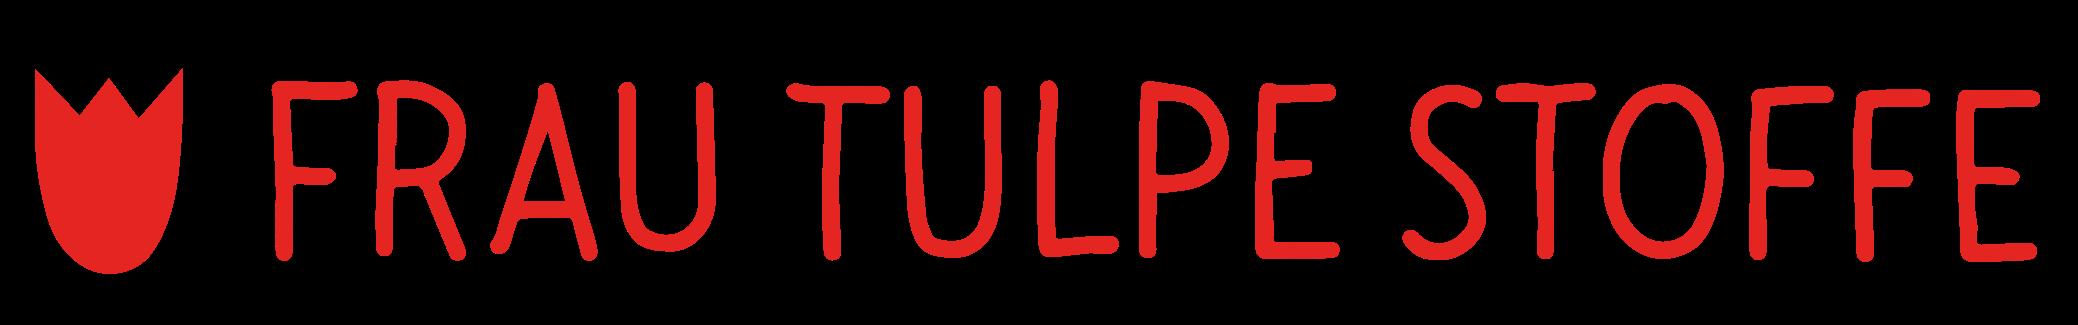 Frau Tulpe